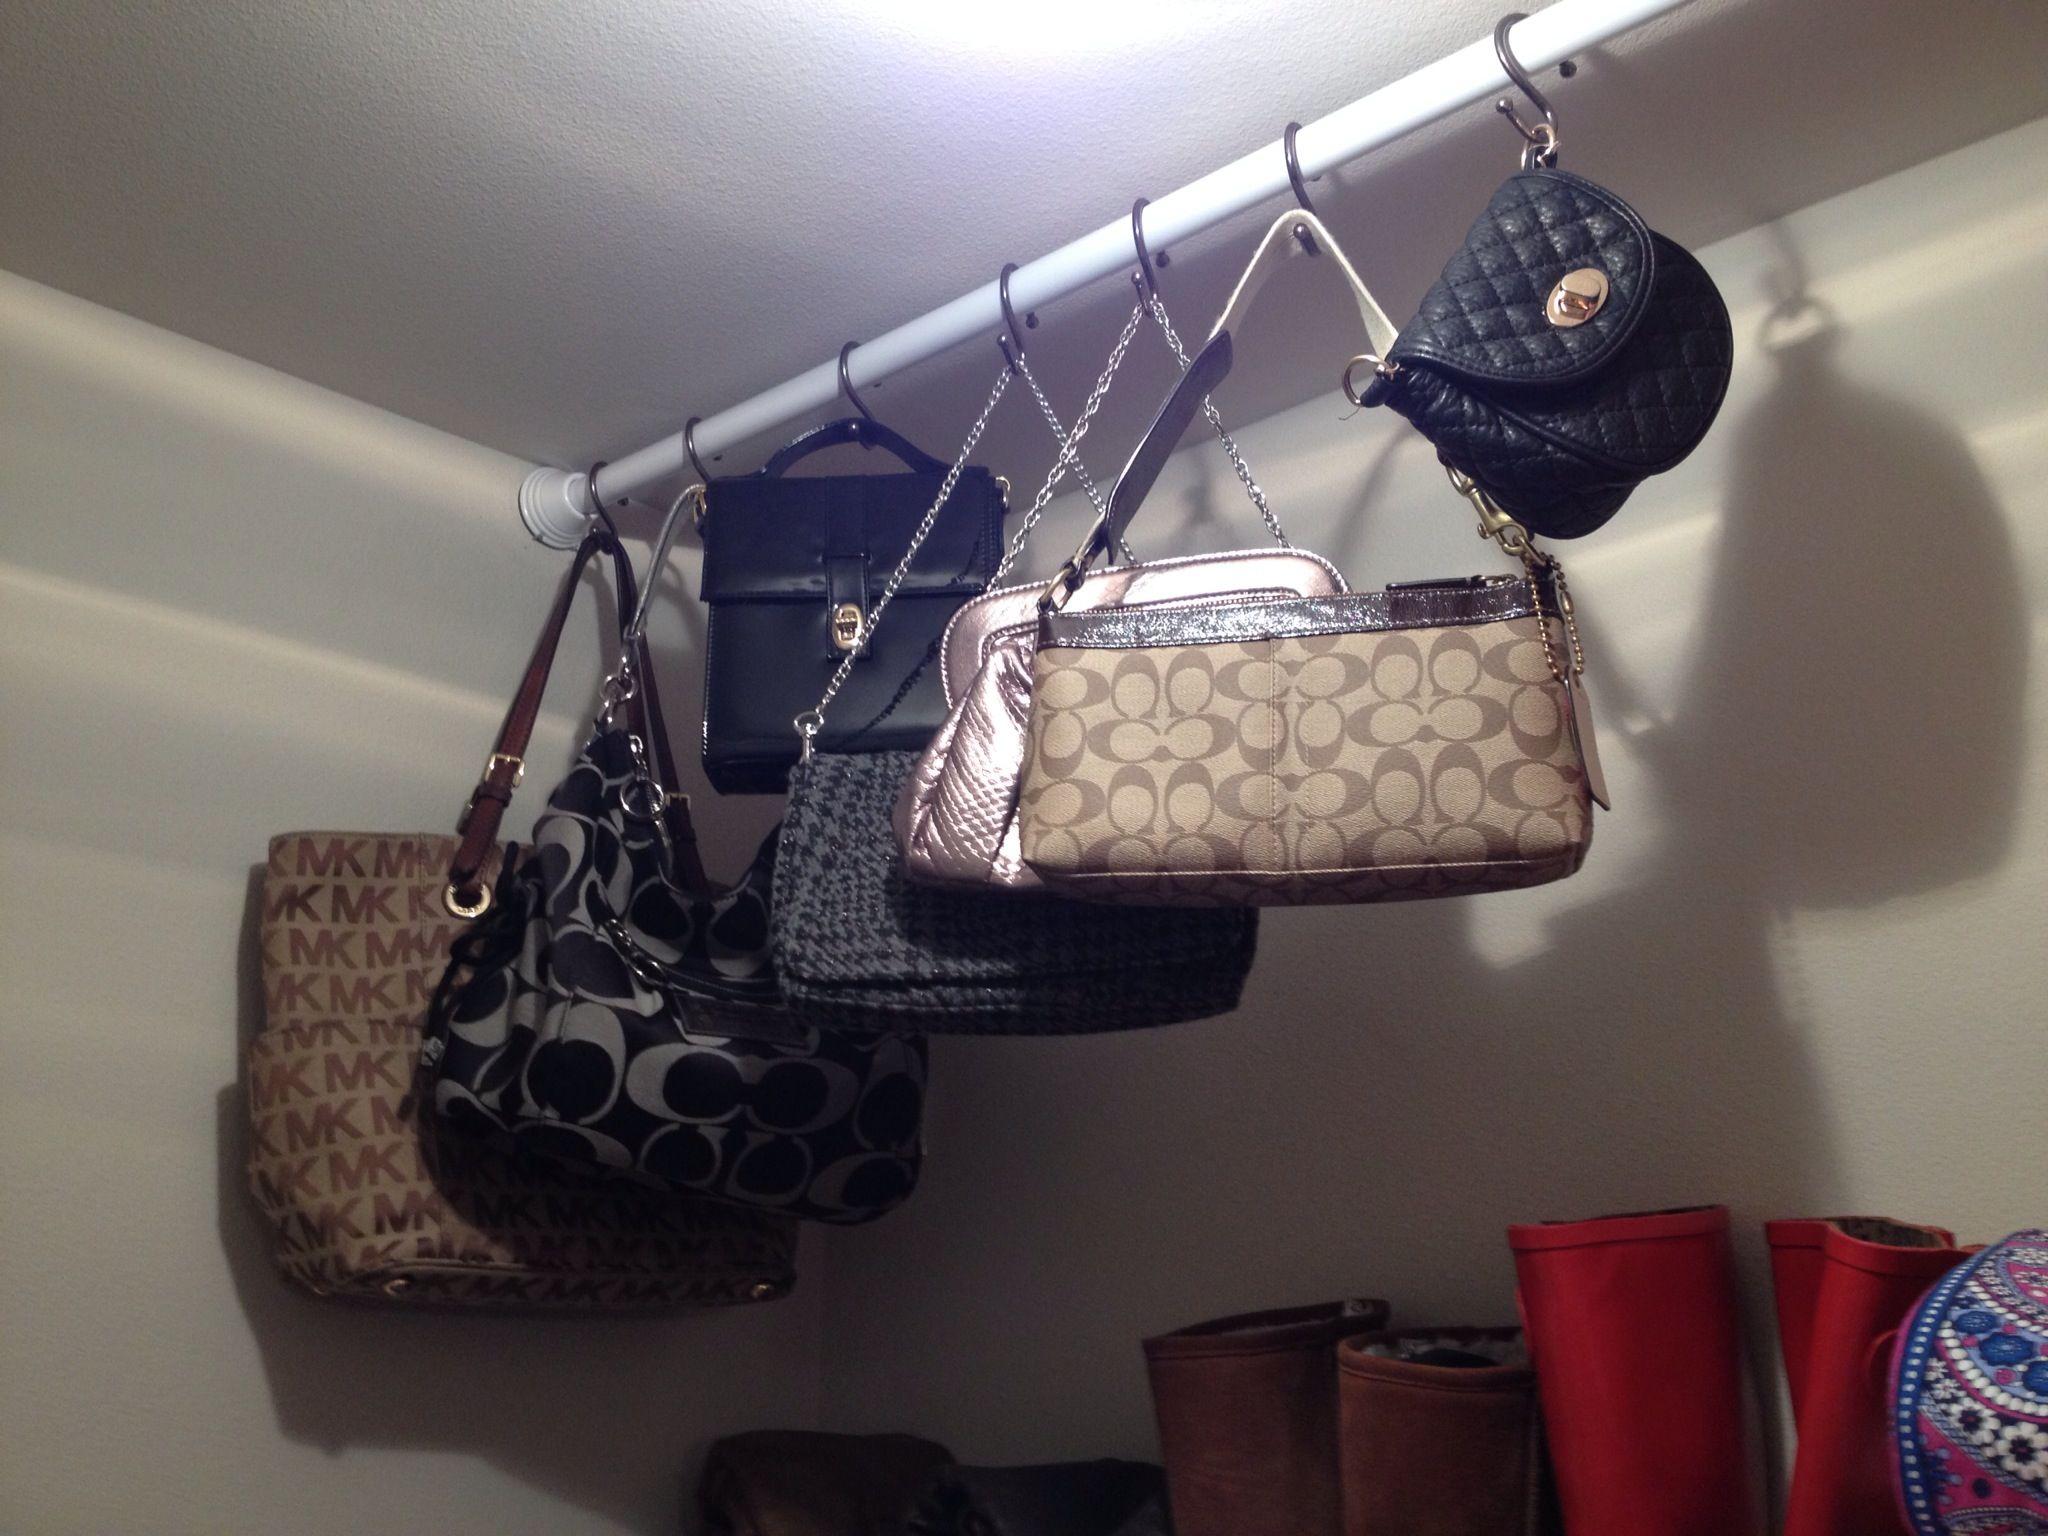 Purse Storage Using Shower Curtain Rod And S Hooks So Functional Purse Storage Purse Organization Handbag Storage